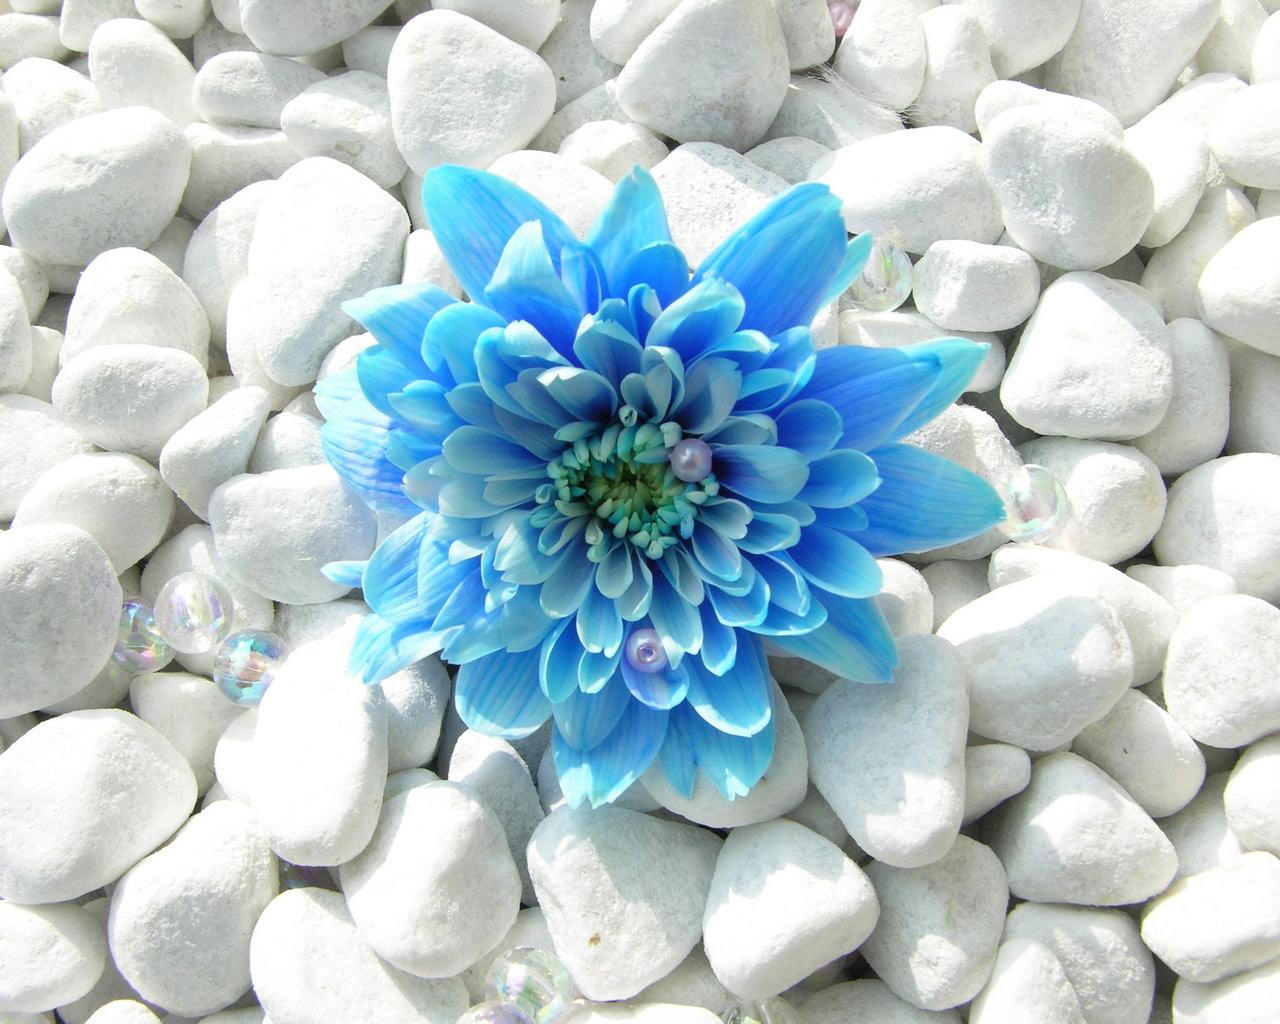 Wallpapers Of Blue Flowers Blue Flower 1280x1024